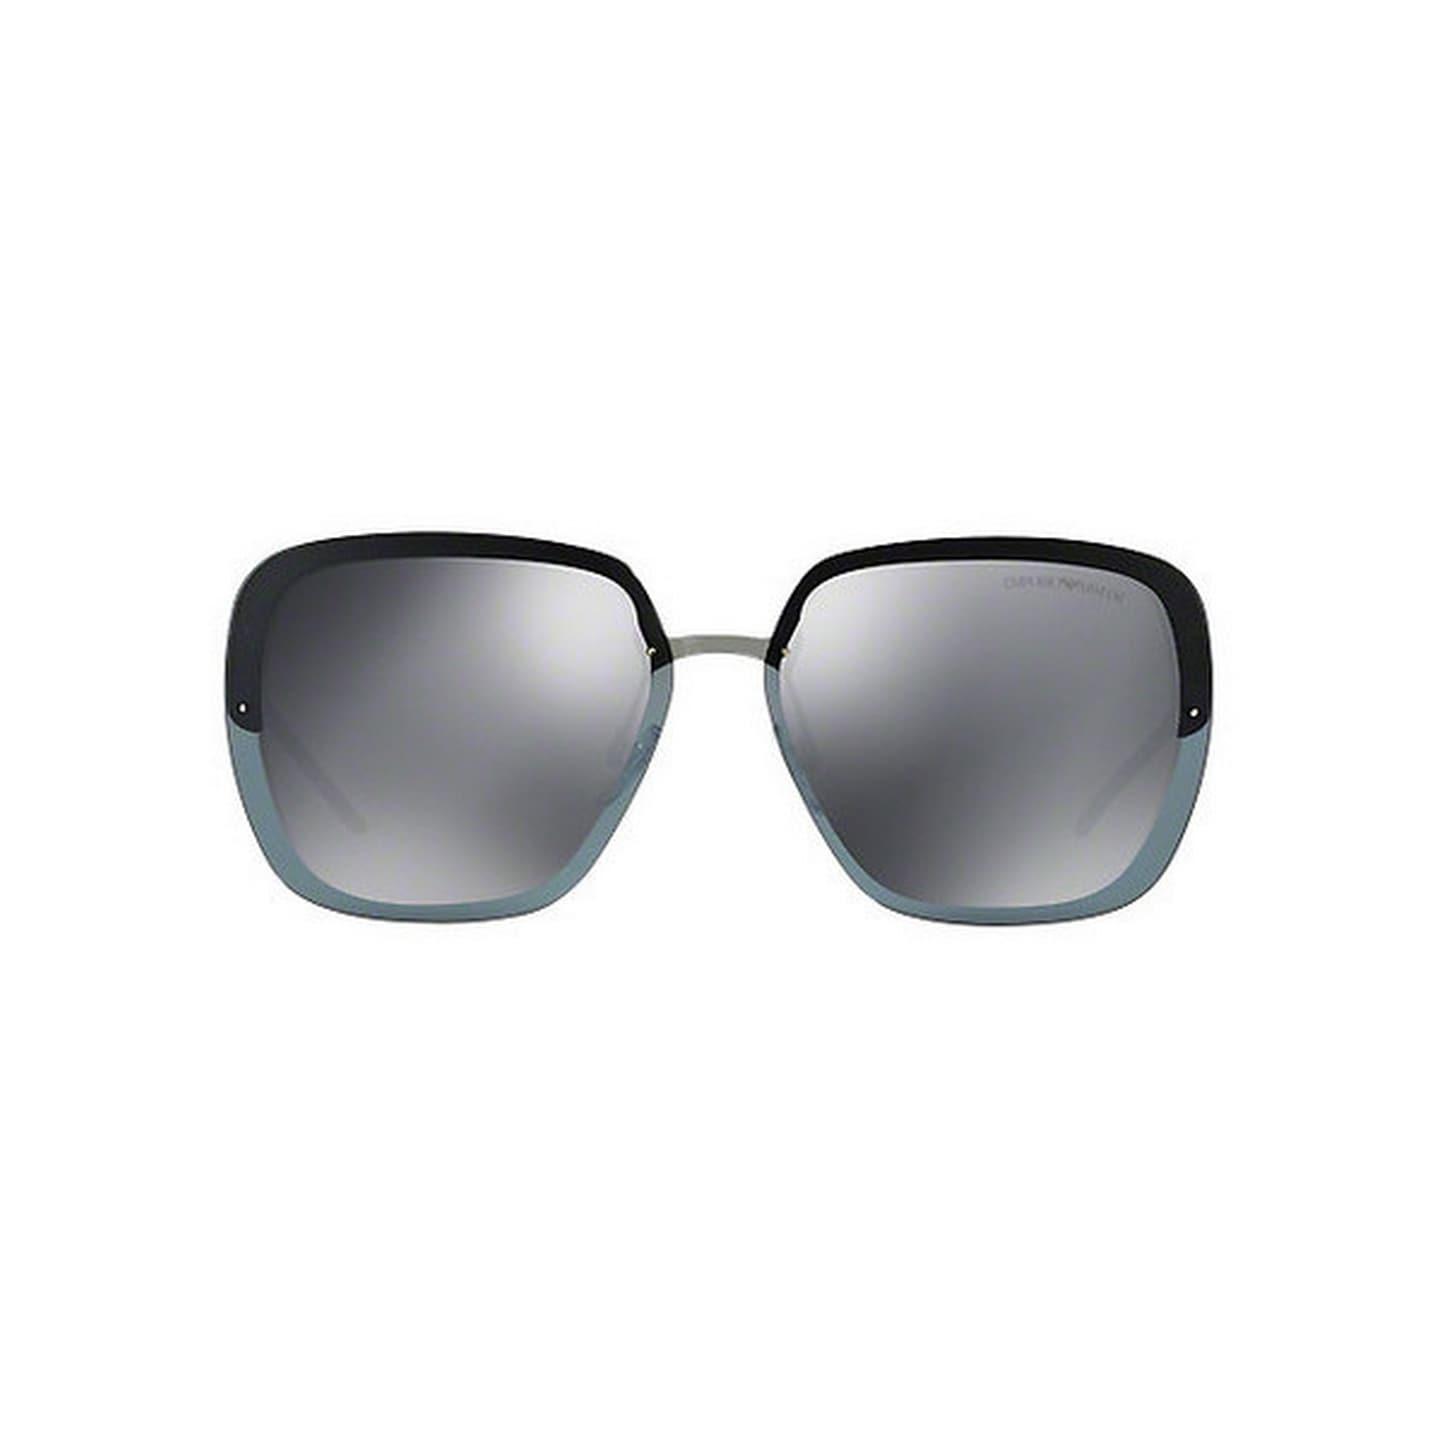 a267717663 Shop Emporio Armani Women s EA2045 30106G 62 Square Metal Plastic Gunmetal  Grey Sunglasses - Free Shipping Today - Overstock.com - 14692289